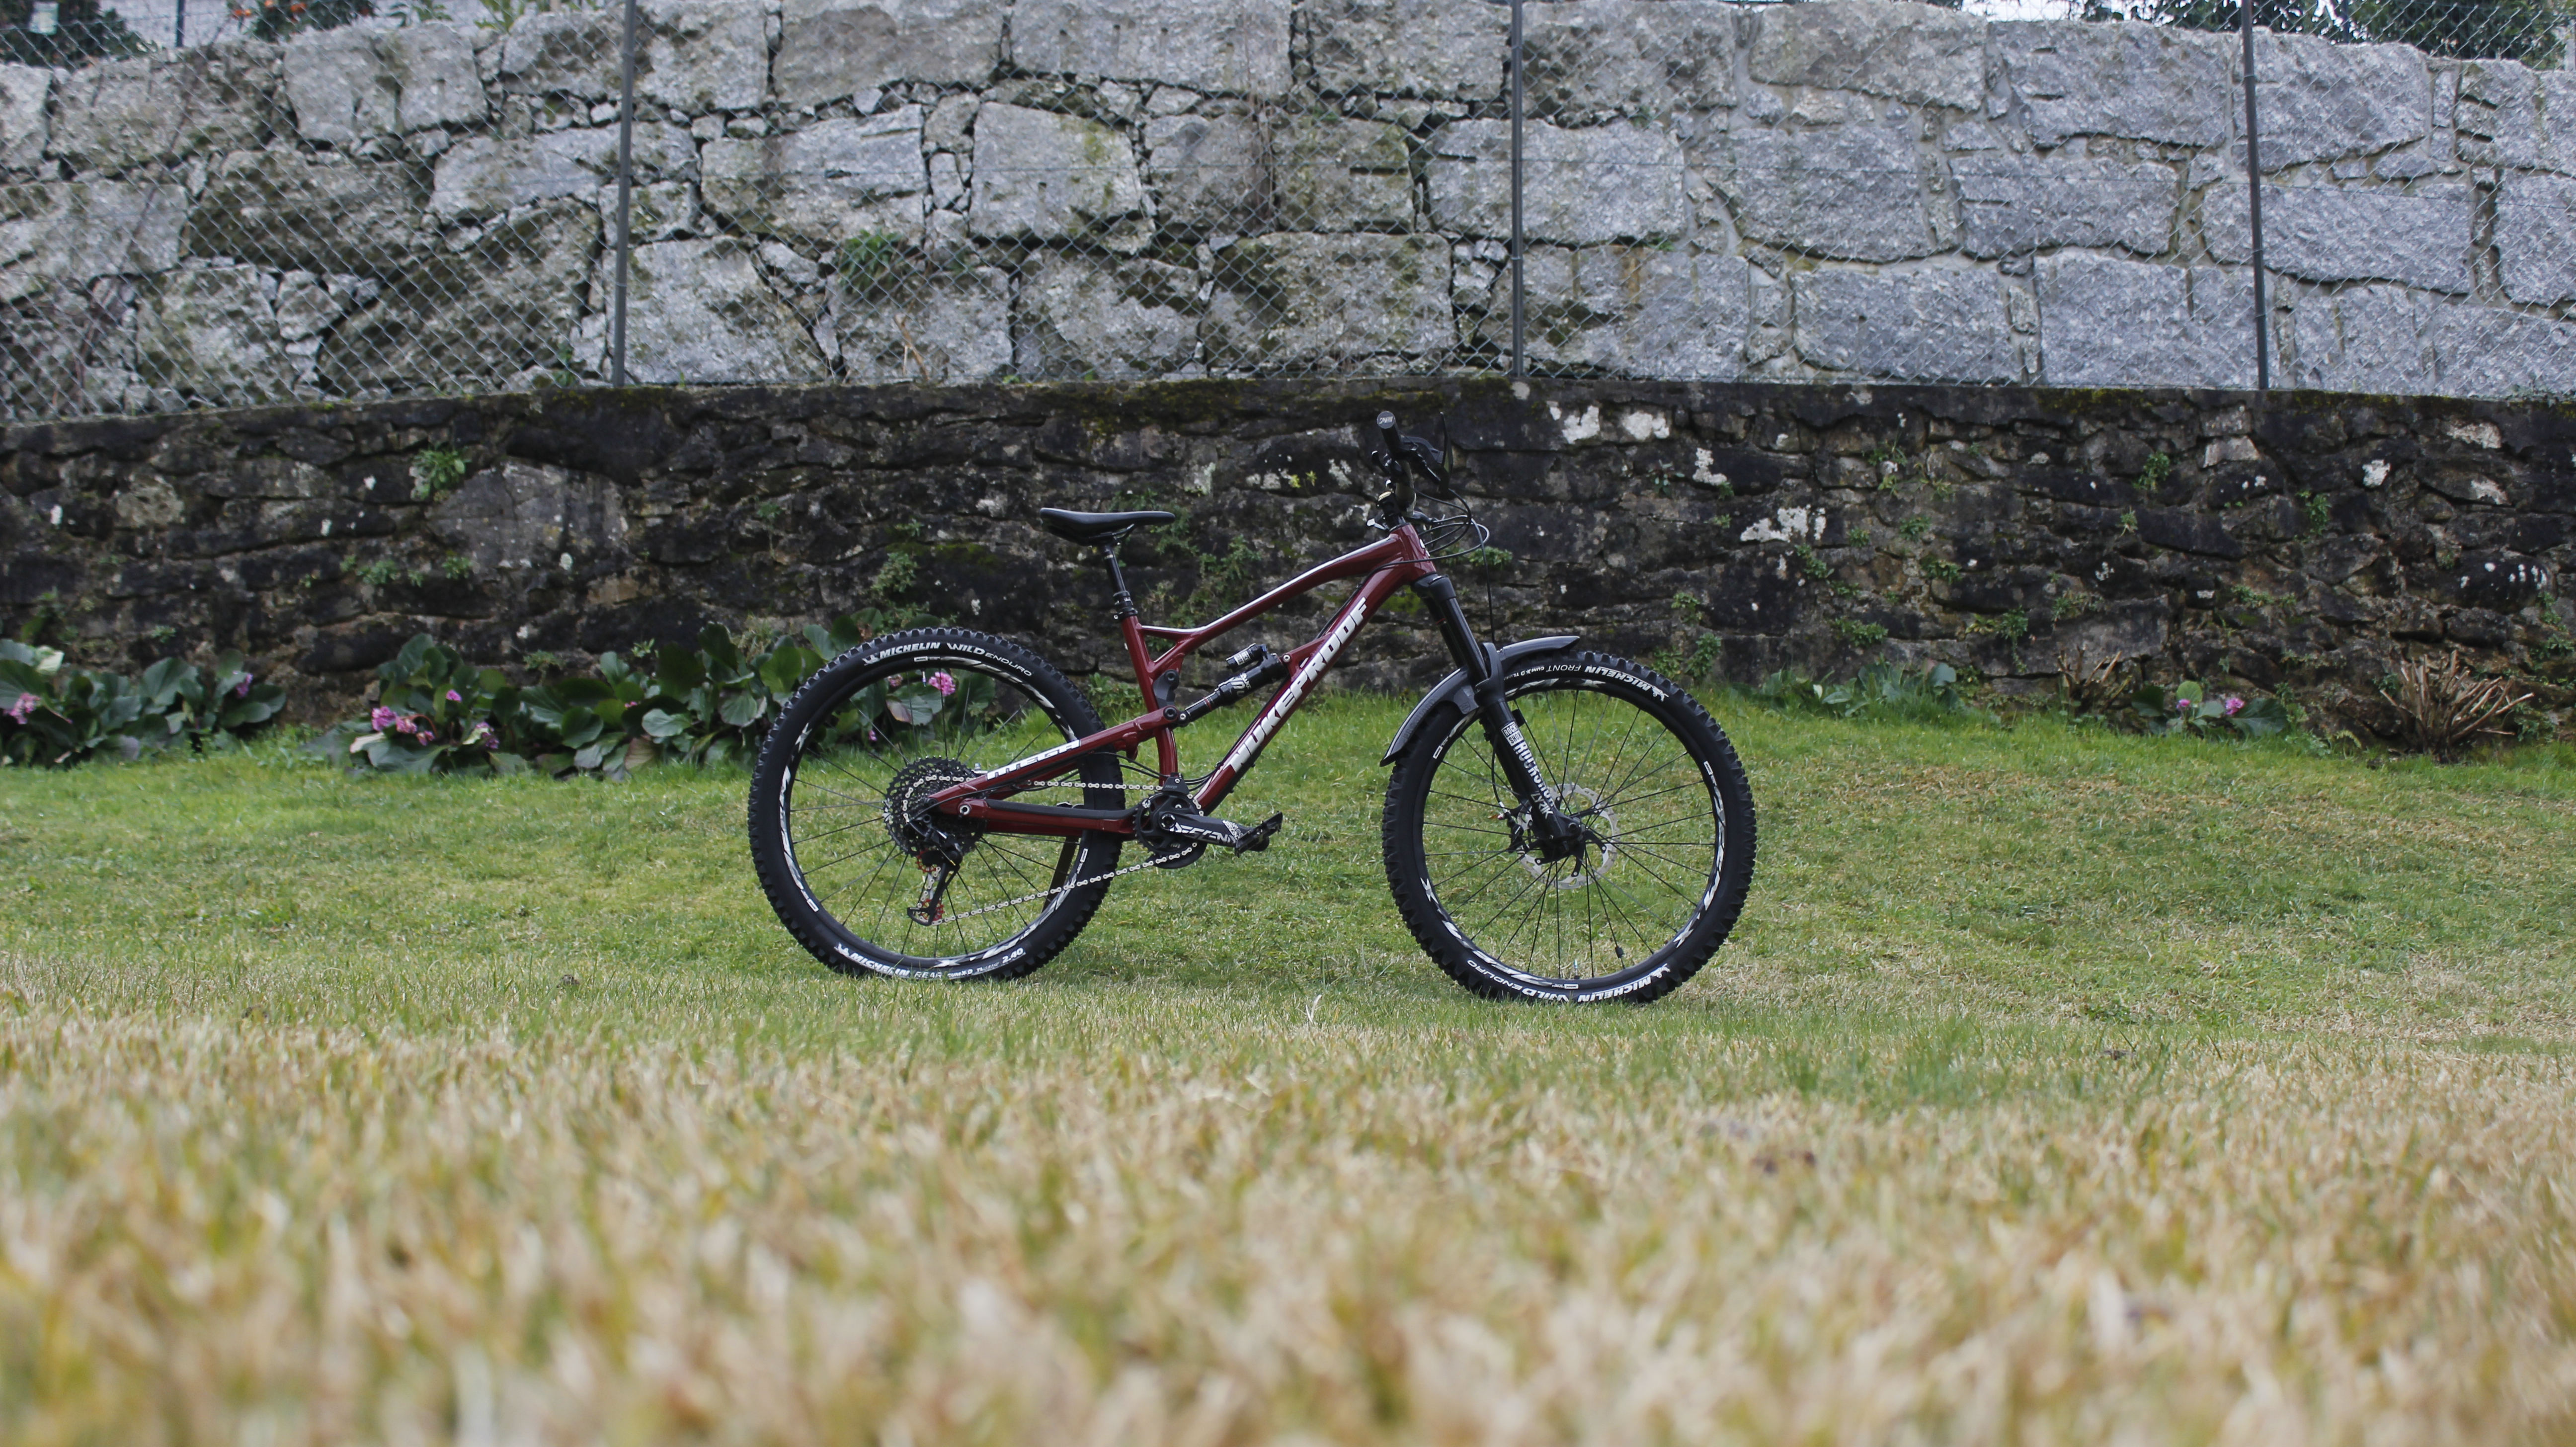 New Stickers Rims Nukeproof mountain bike decals fork custom